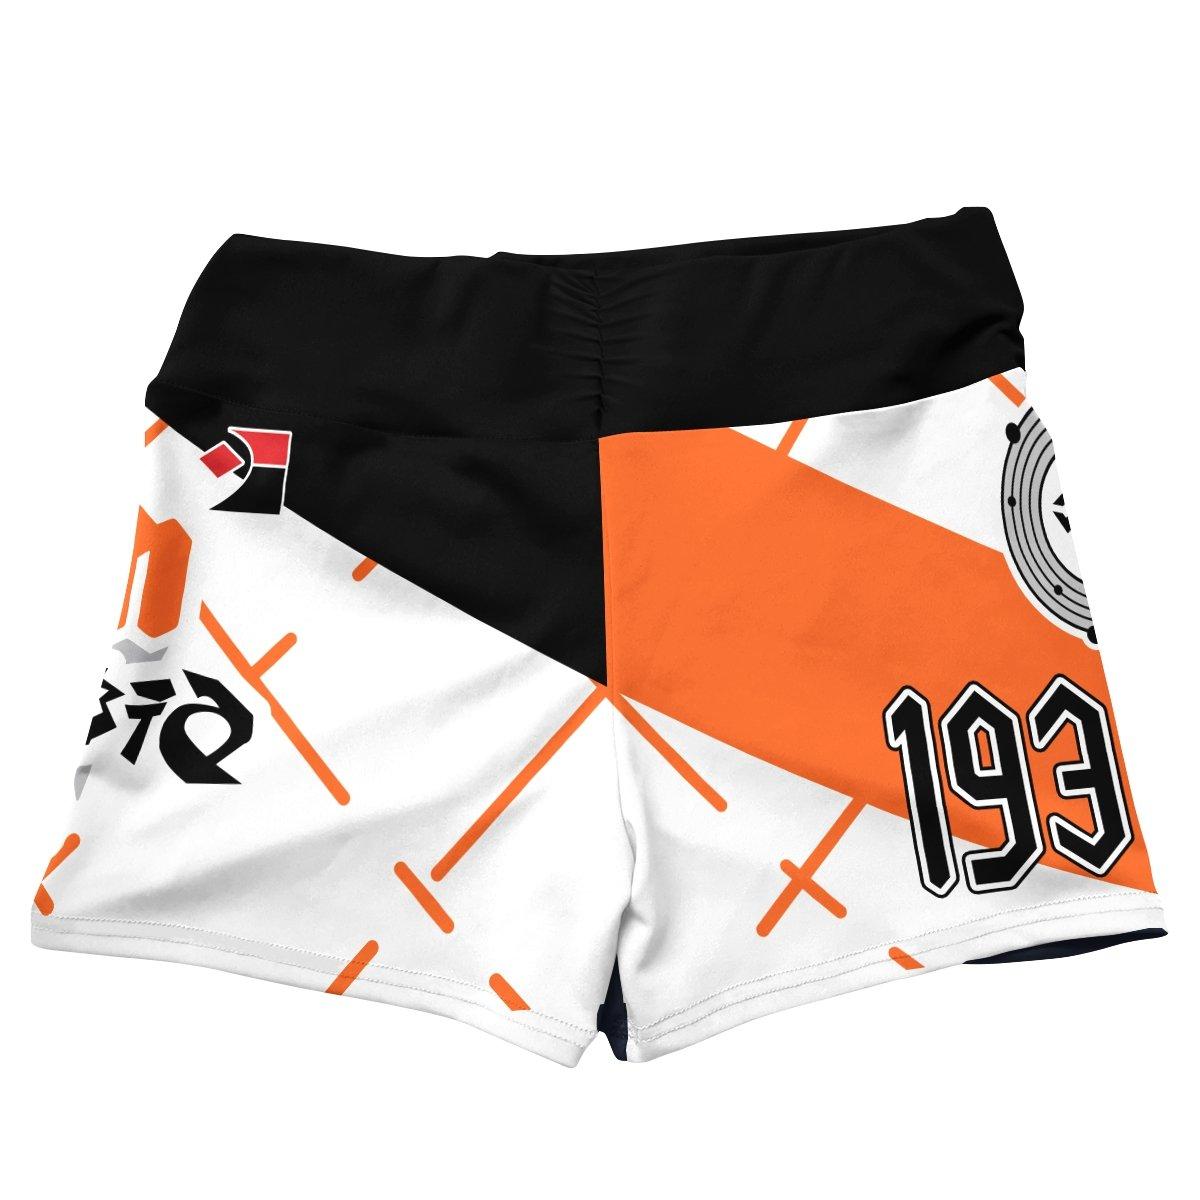 pokemon fighting uniform active wear set 981992 - Anime Swimsuits